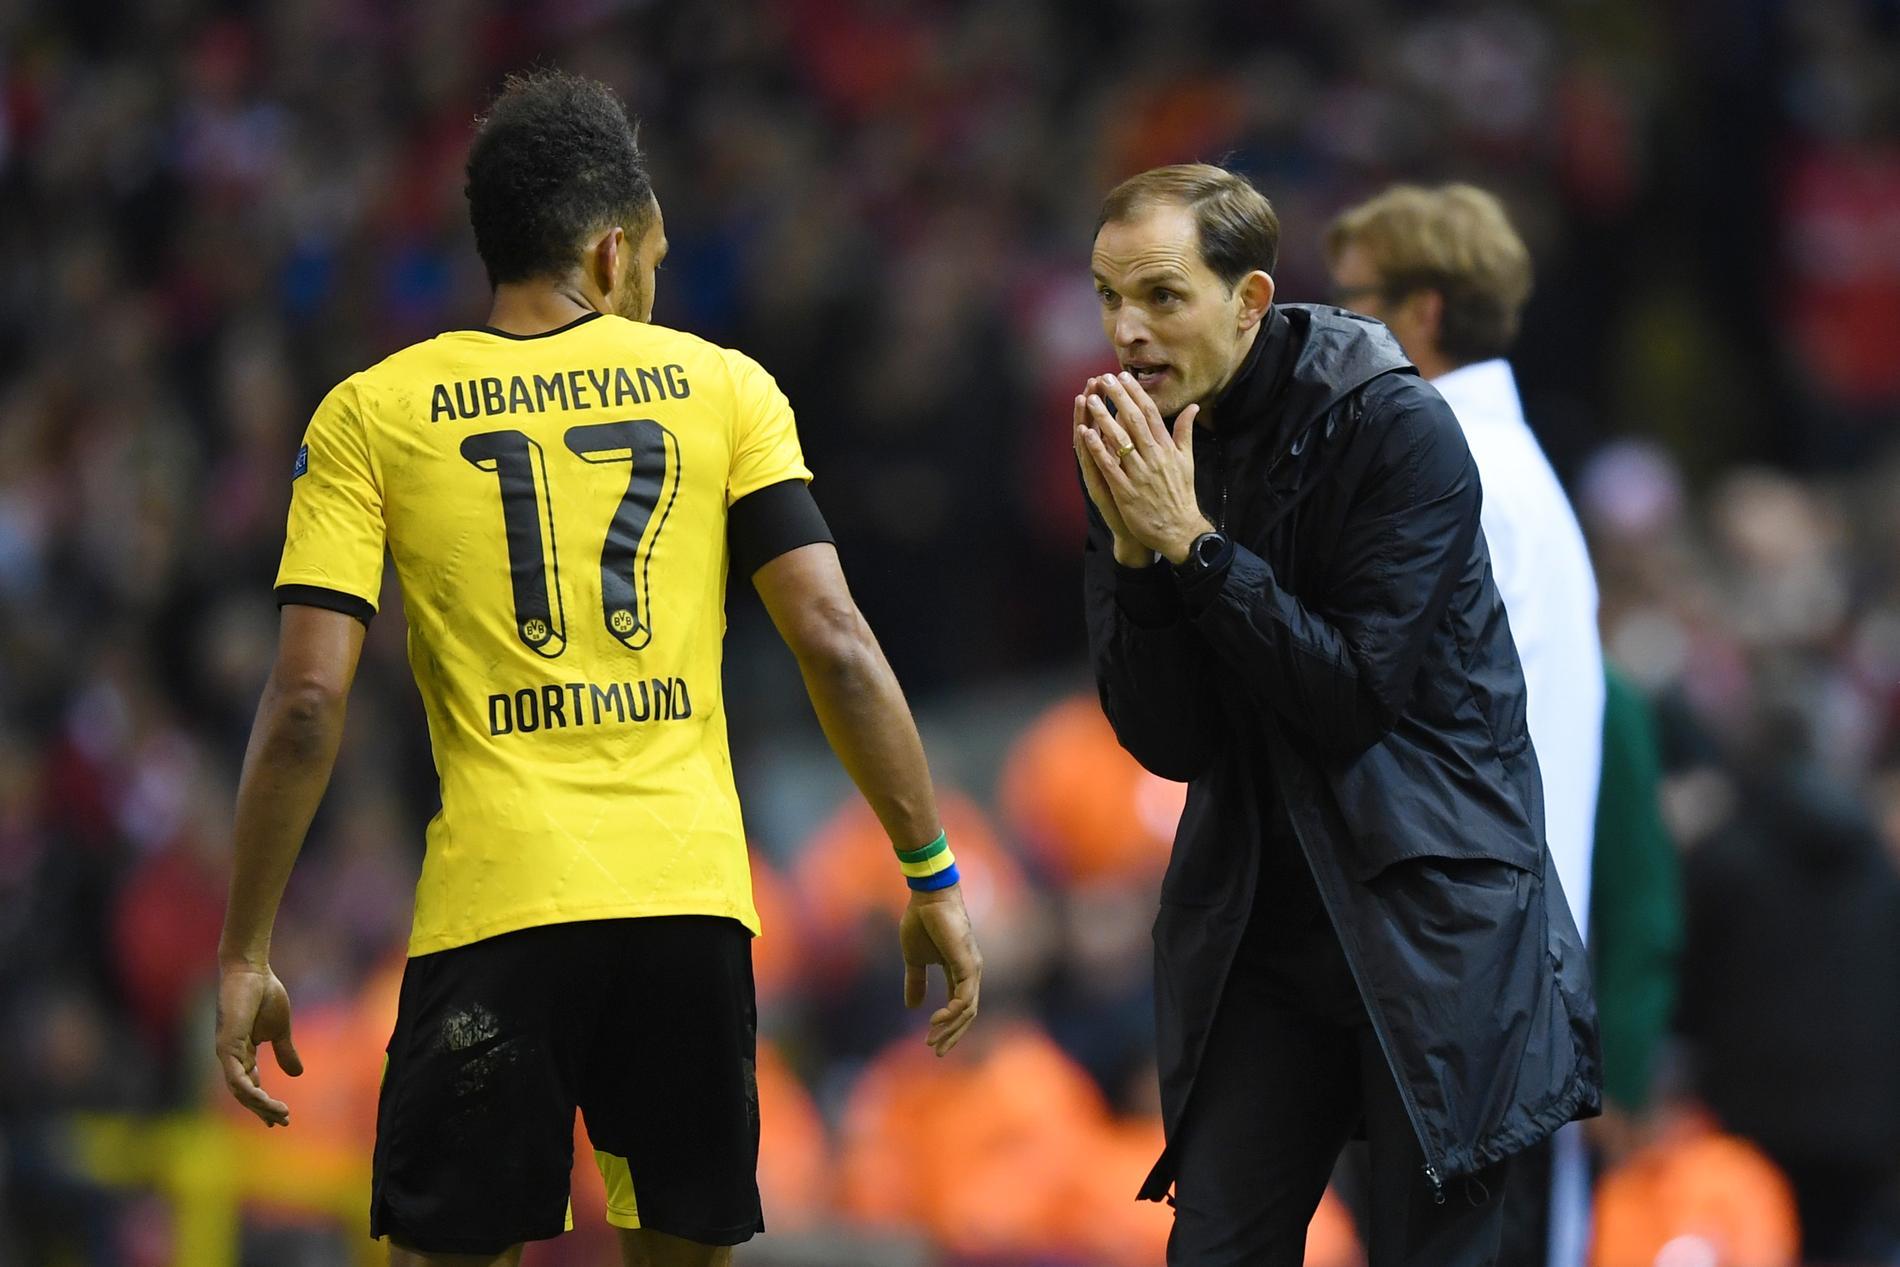 Aubameyang och Tuchel i Dortmund.